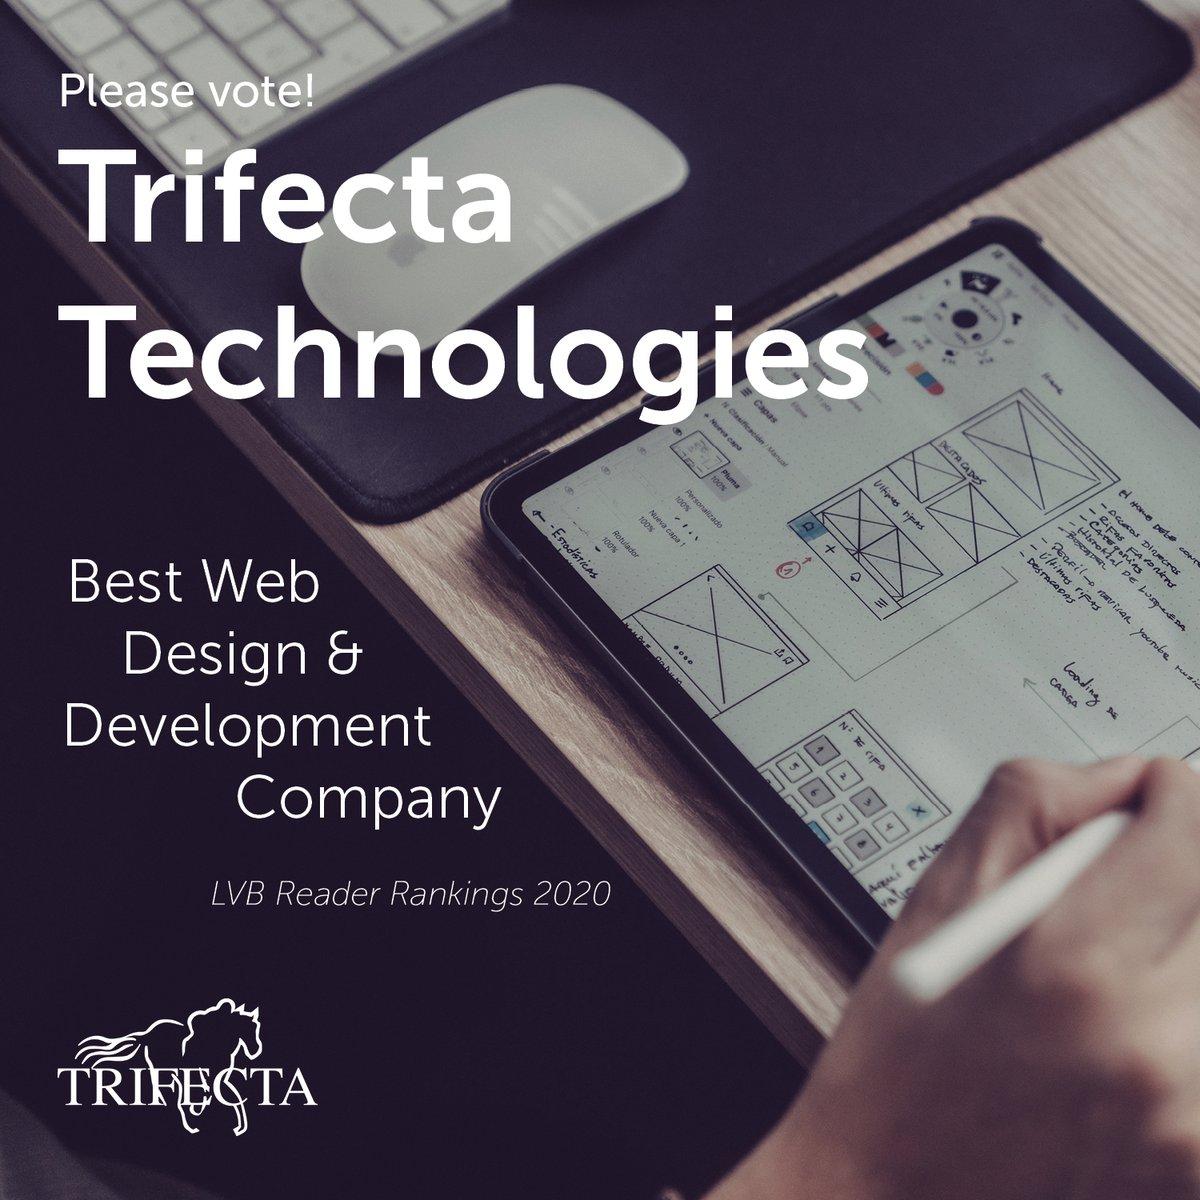 Vote #Trifecta for Best Web Design & Development Company in the 2020 @LVB_com Reader Ranking Awards! https://t.co/qwkxVwjn5O #readerrankings #bestof #ux #webdesign https://t.co/Xi2W8ldQG8